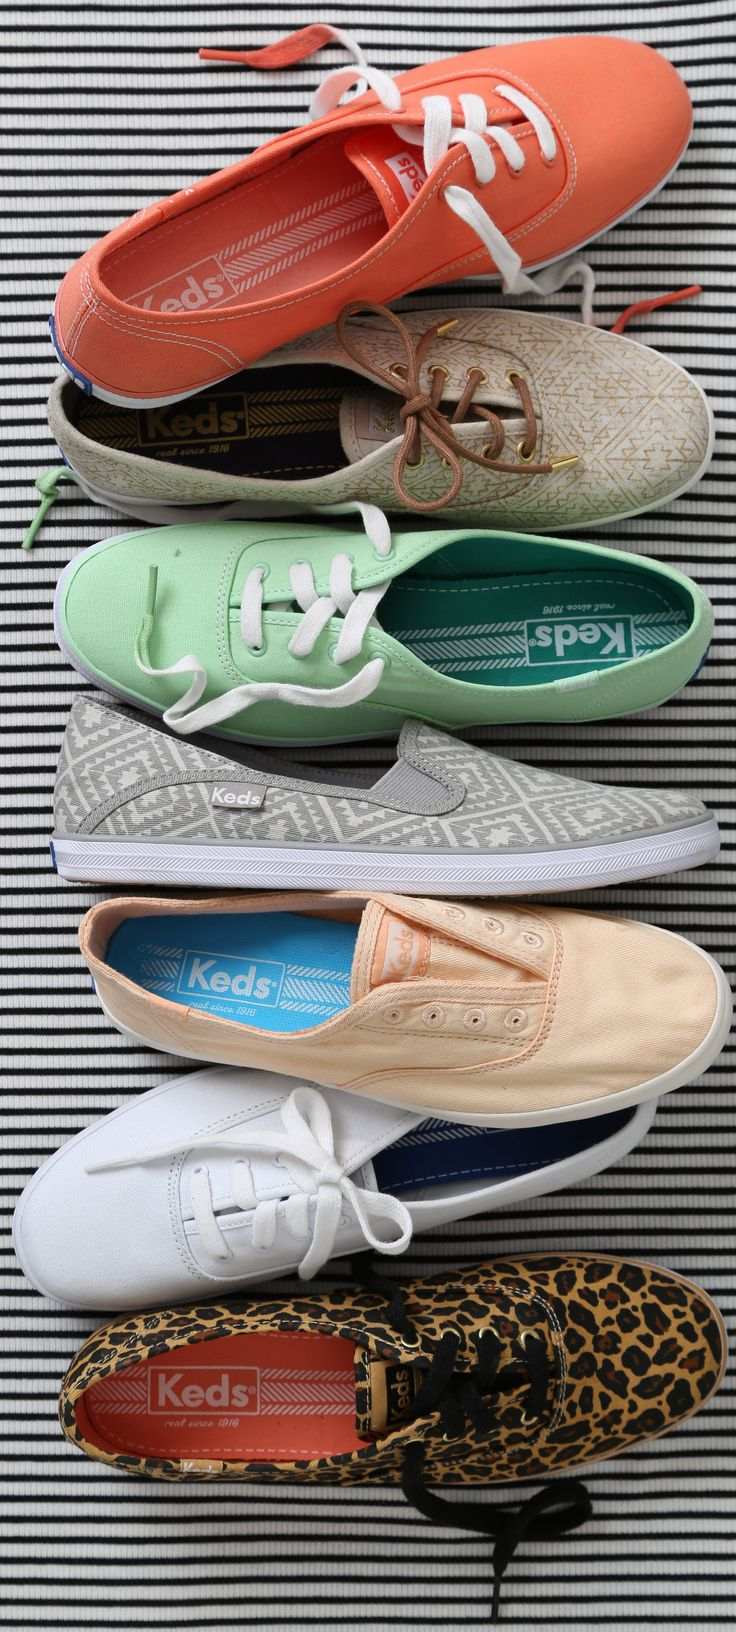 Women's Keds Casual Shoes & Tennis Shoes | Buckle